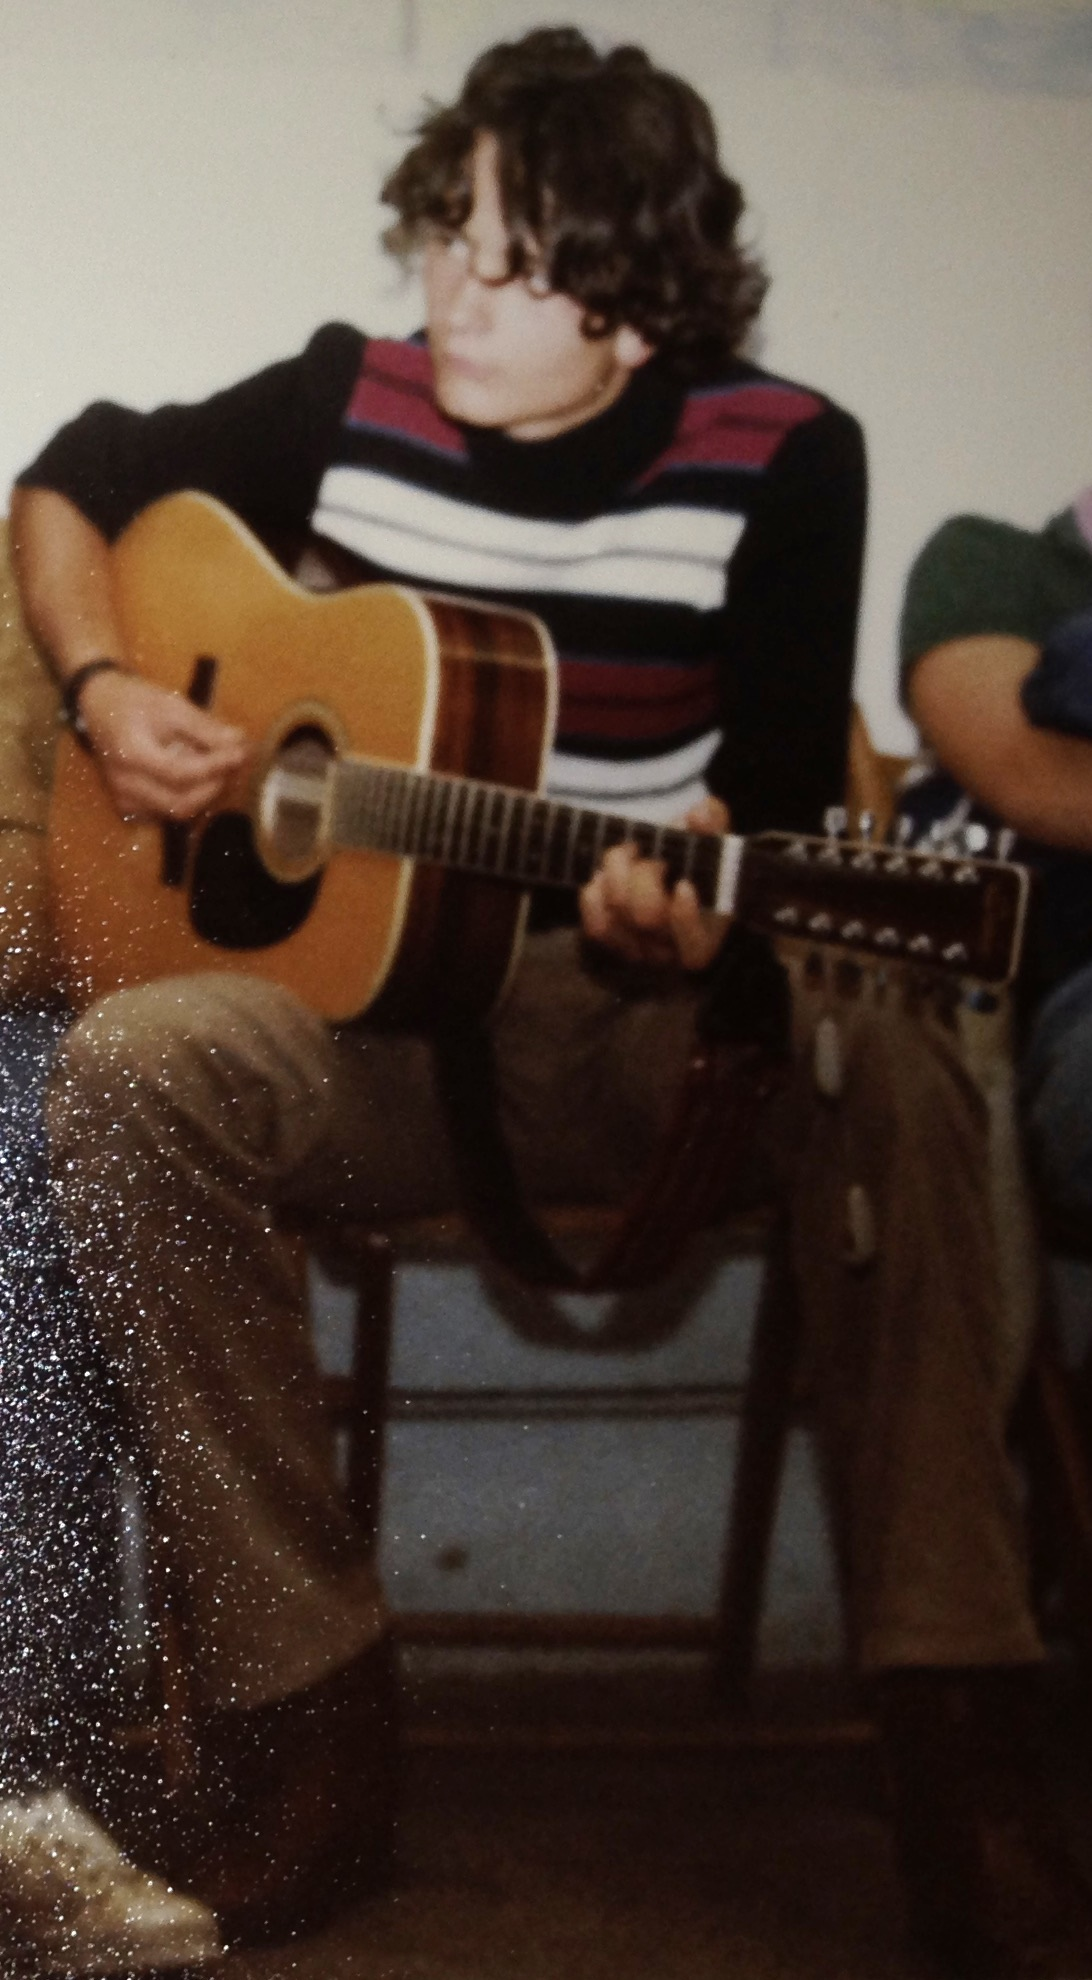 Reiner Gitarre Klassenfahrt